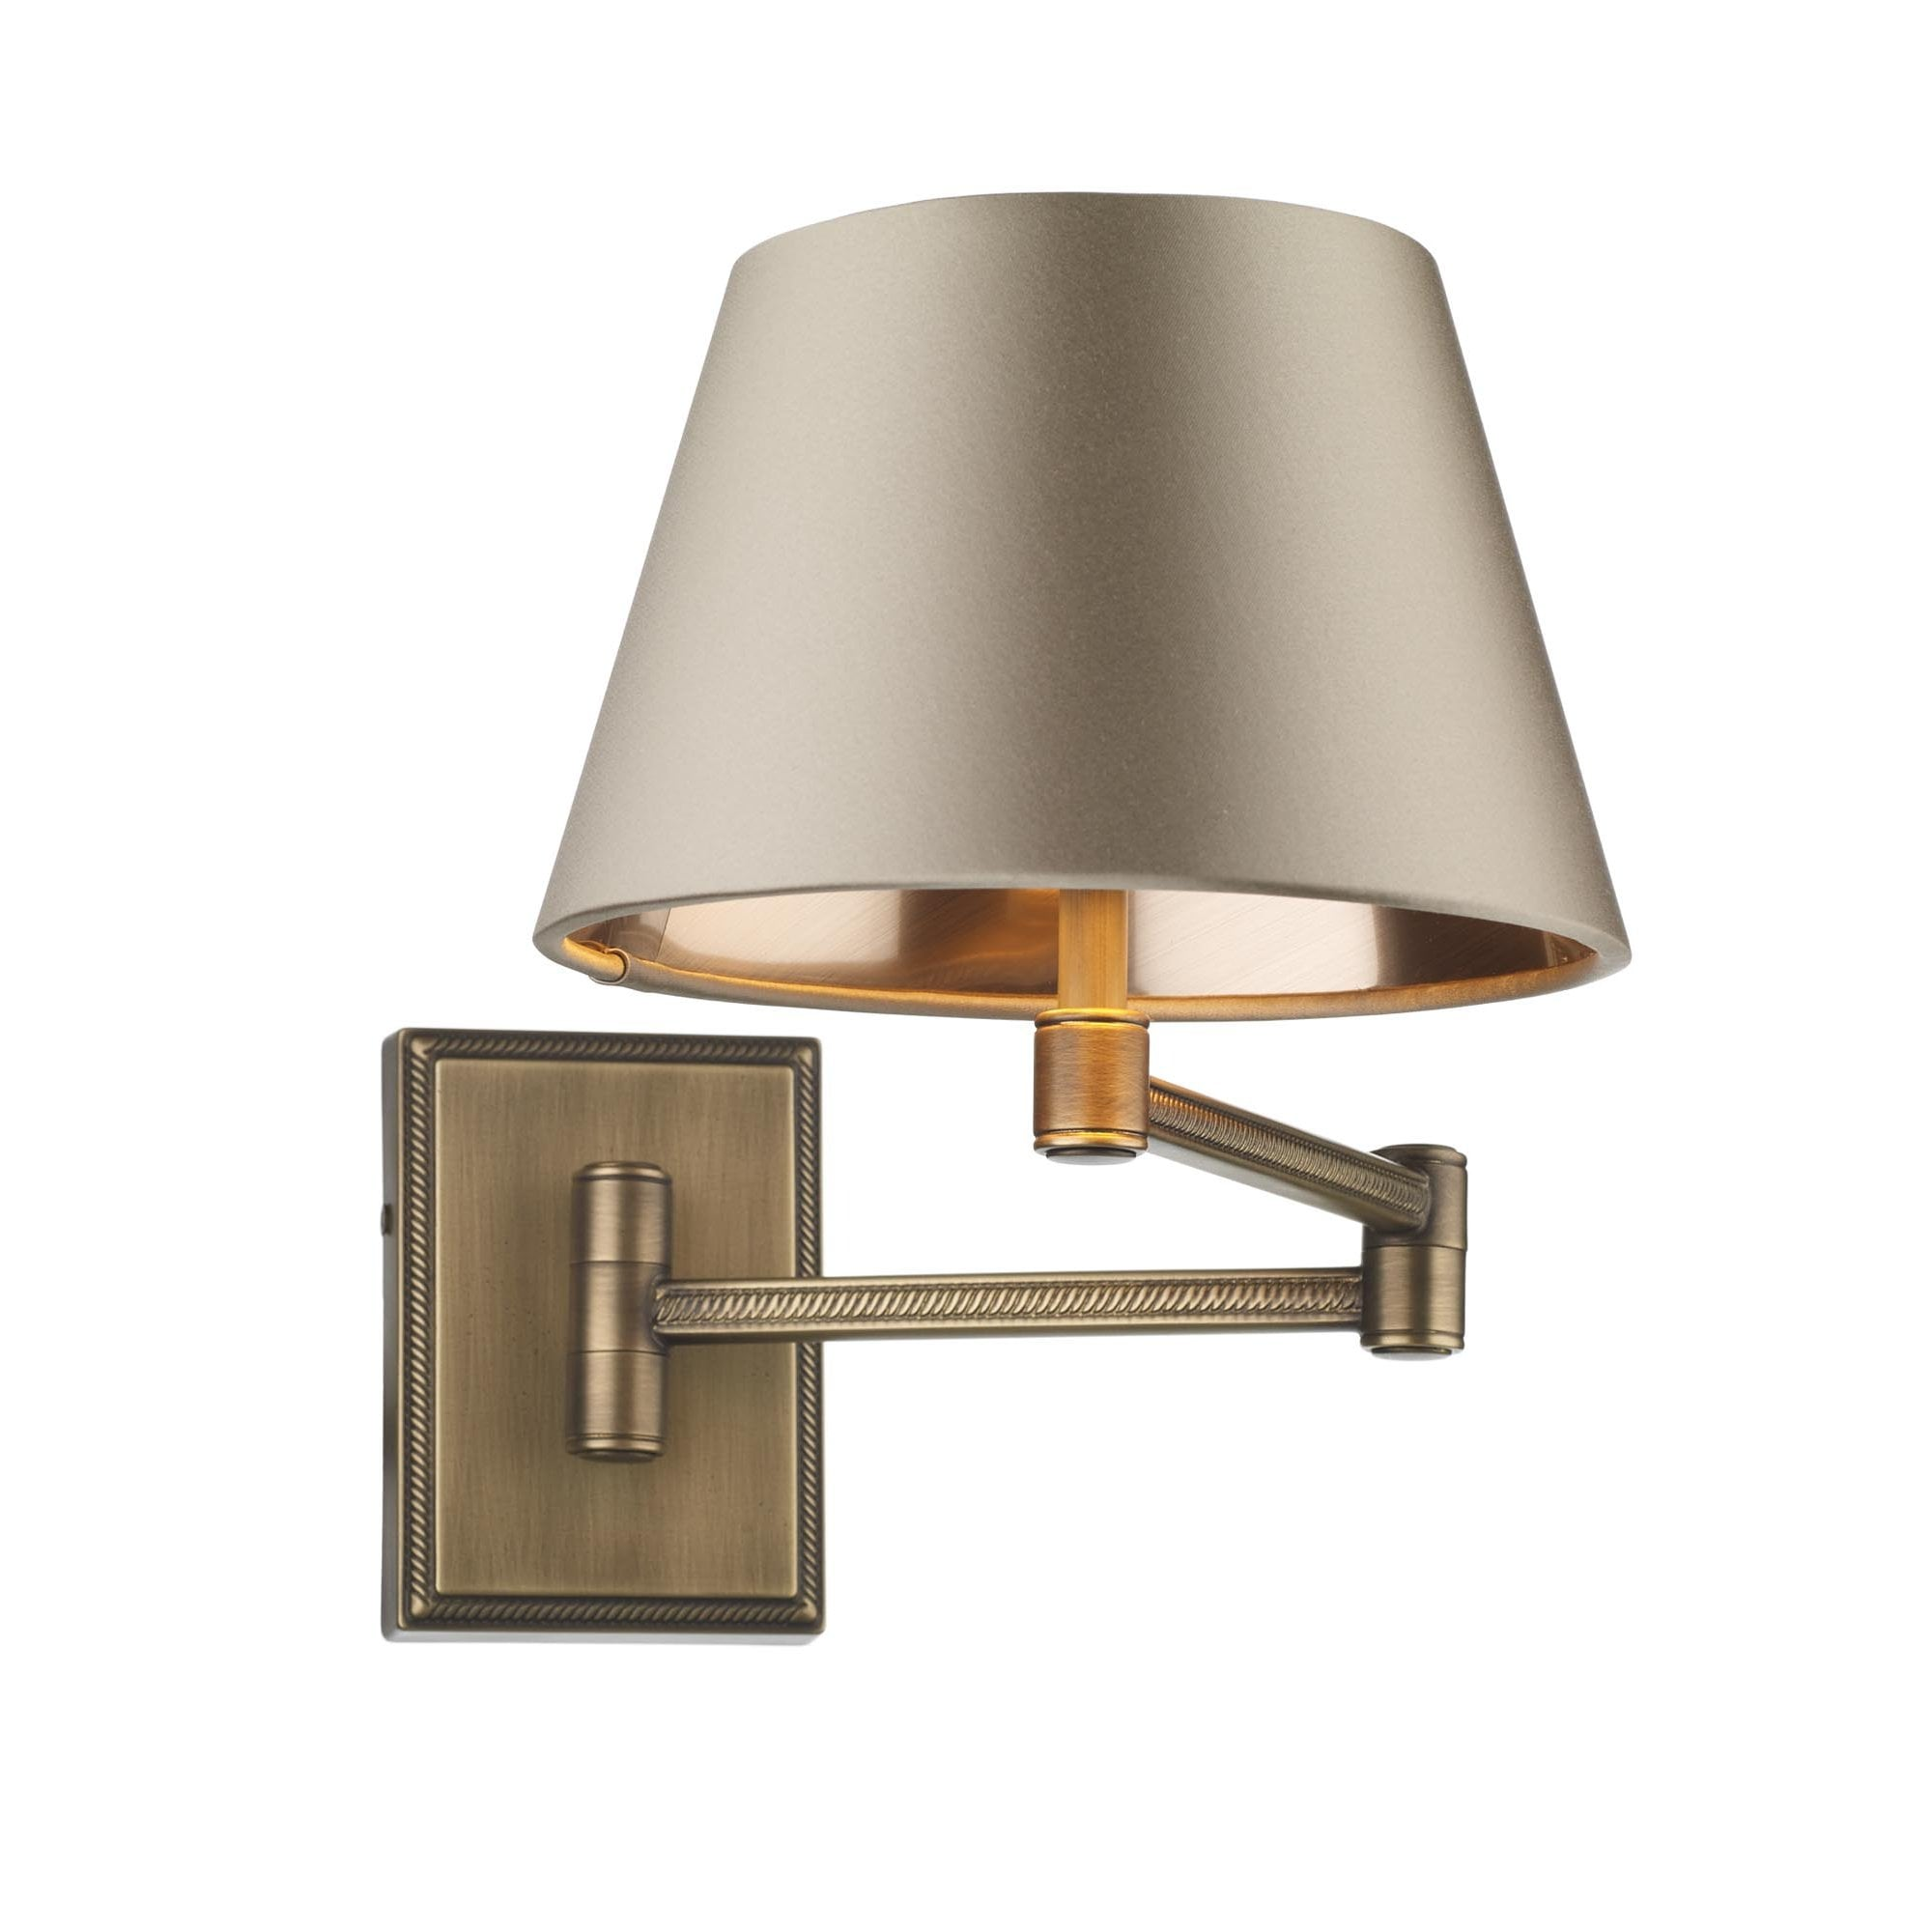 Swing Arm Wall Light Piped Antique Brass David Hunt Lighting Company